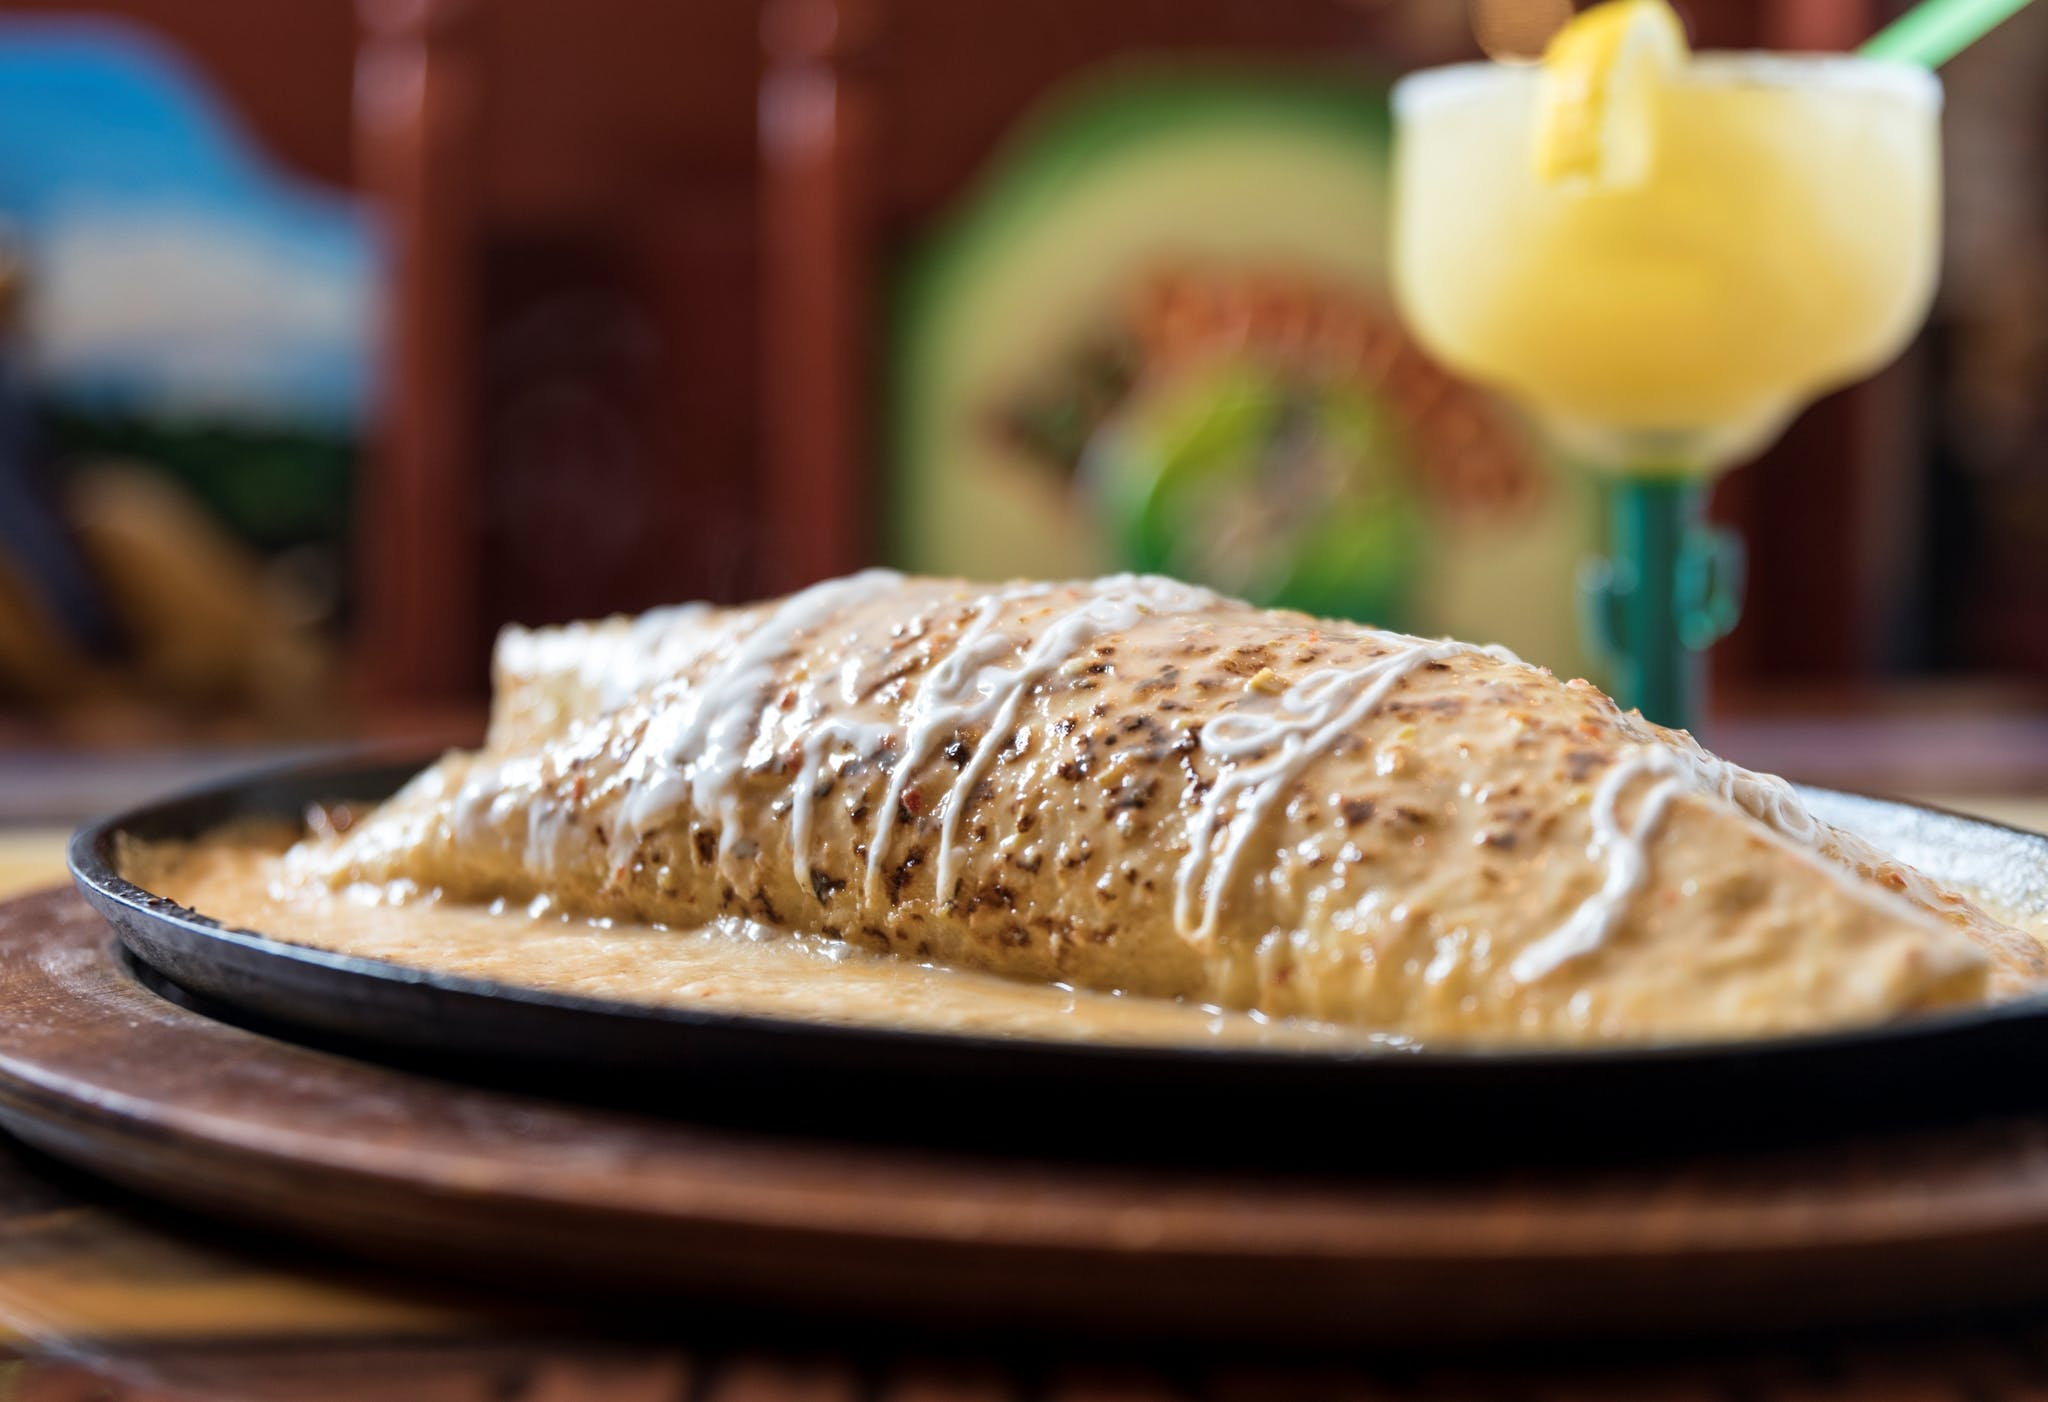 Parrillada Burrito from Los Jaripeos in Oshkosh, WI